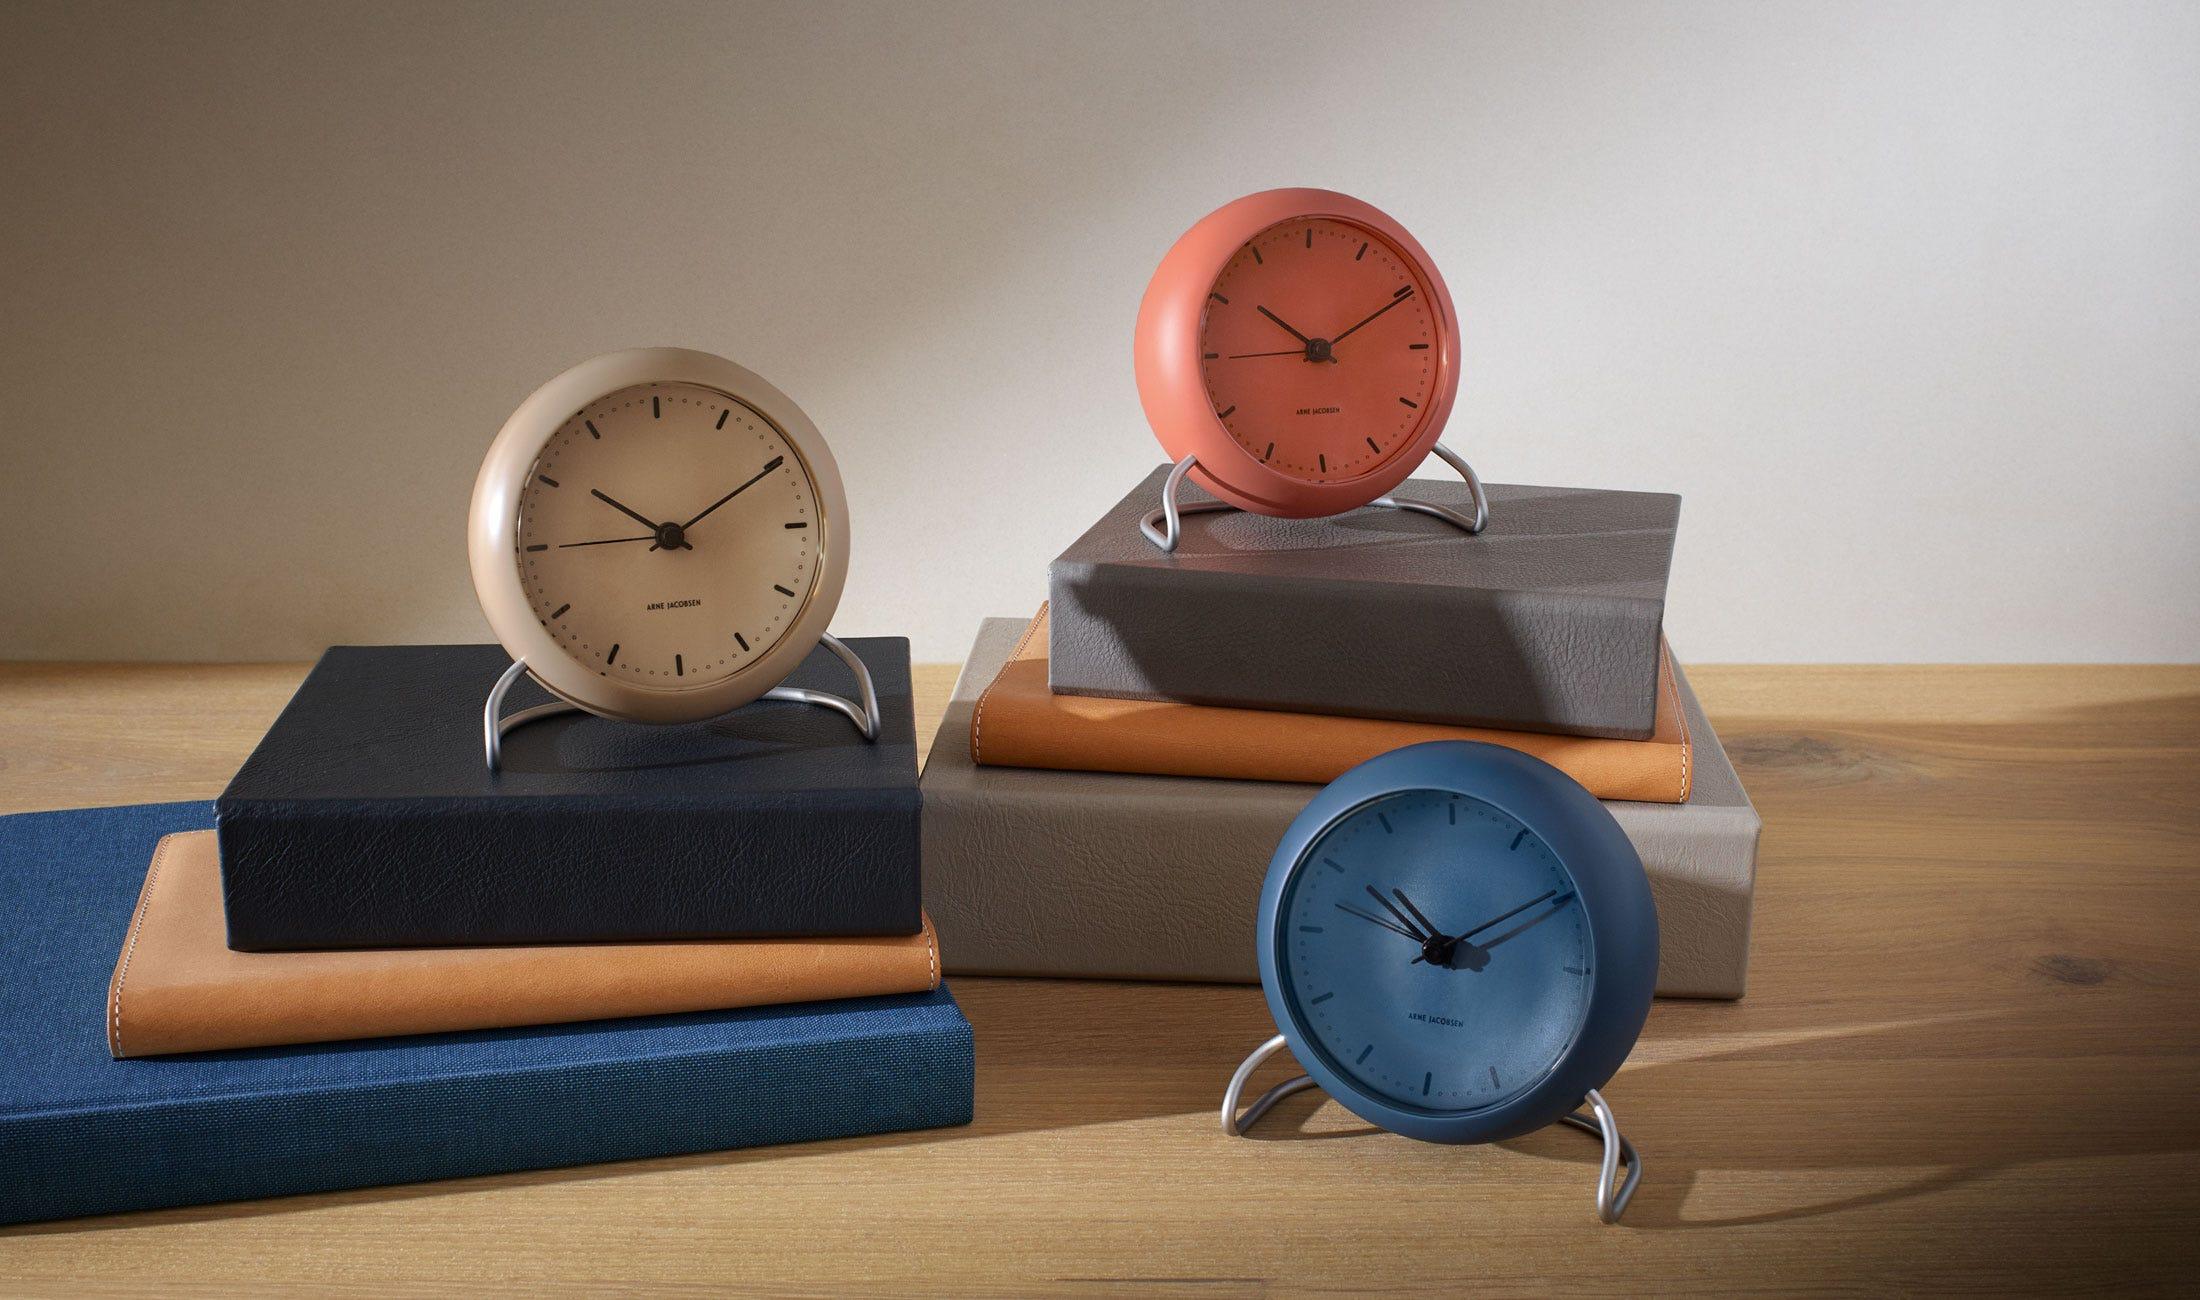 Desk clocks – Small table clocks in